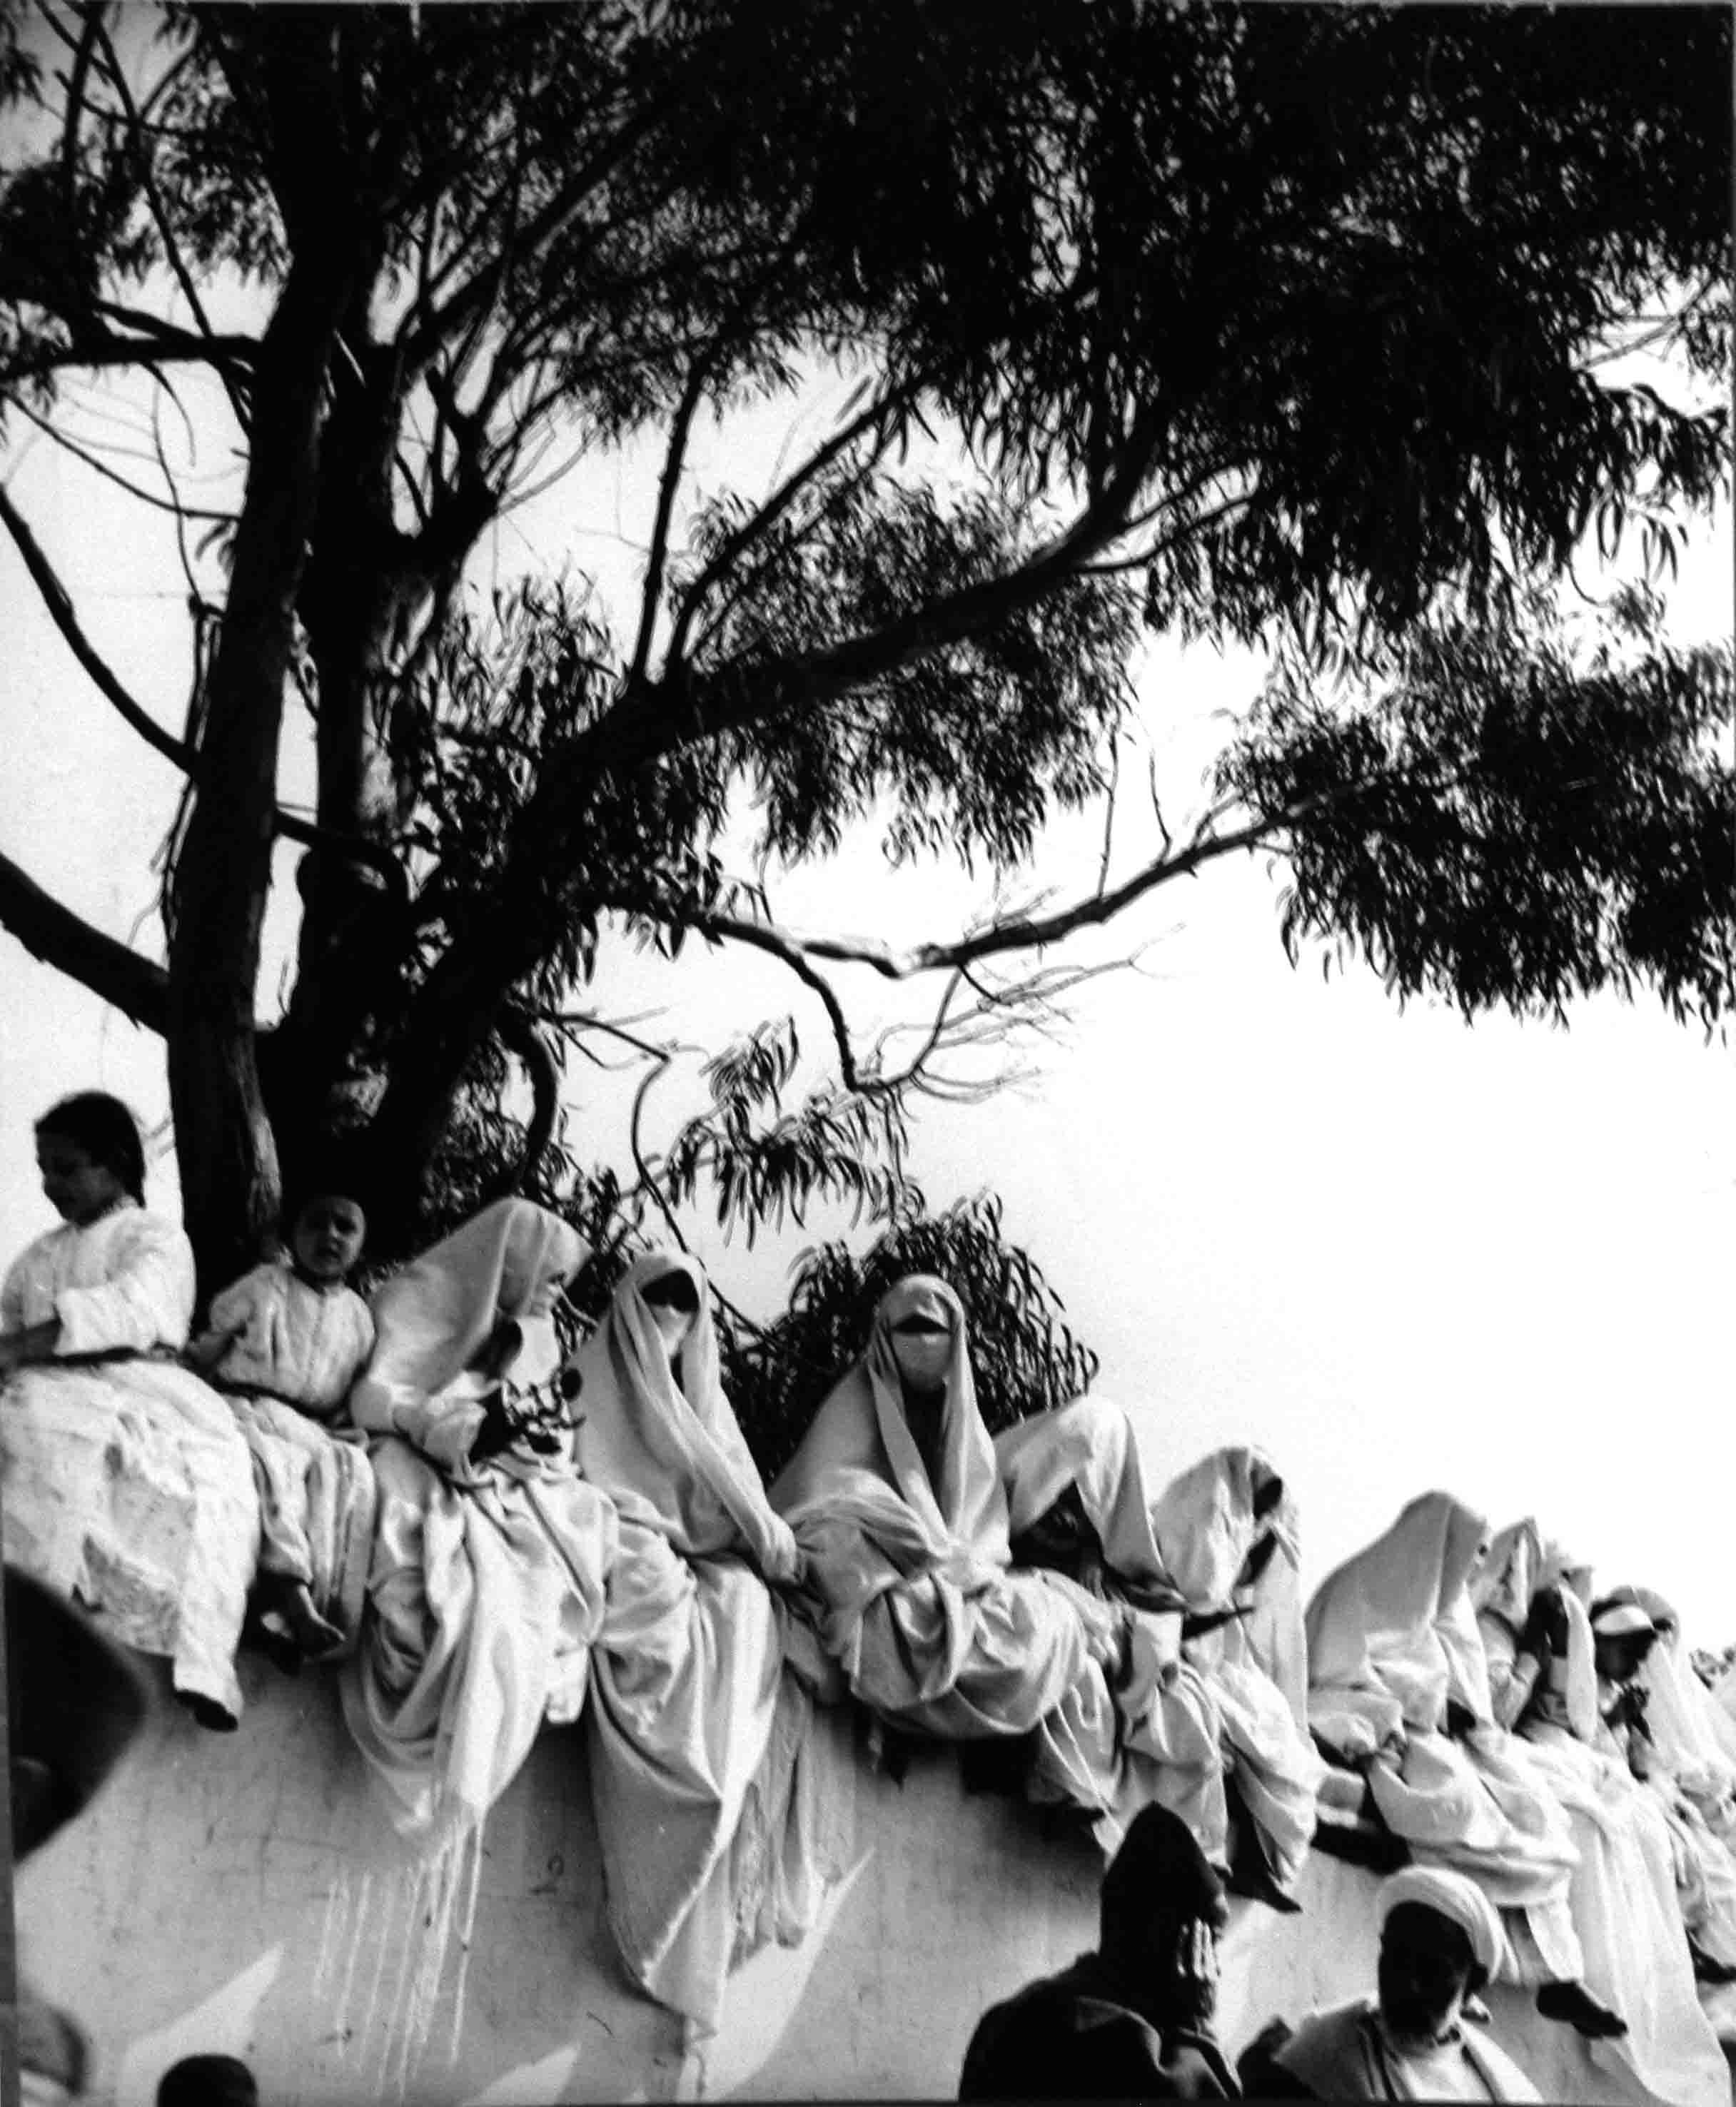 Mujeres sobre muro. Tanger, 1942<br/>Gelatina de plata / Silver gelatin print